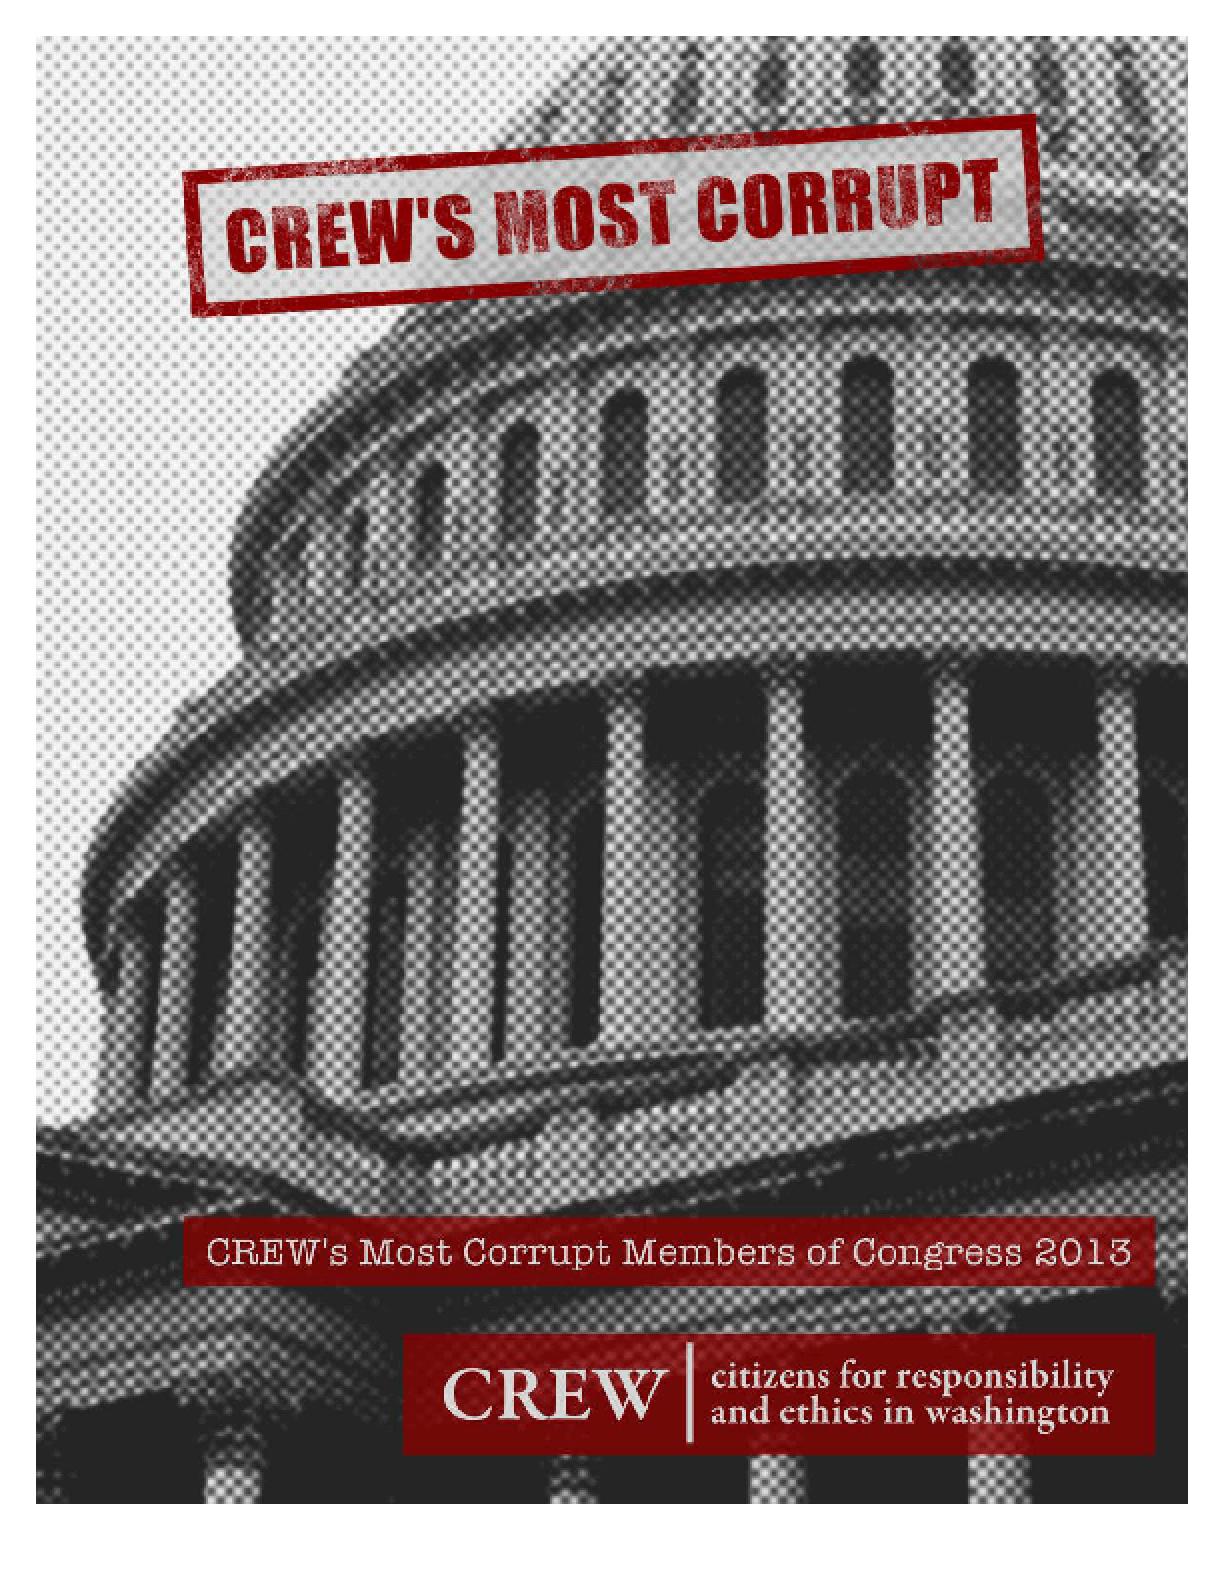 CREW's Most Corrupt Members of Congress 2013